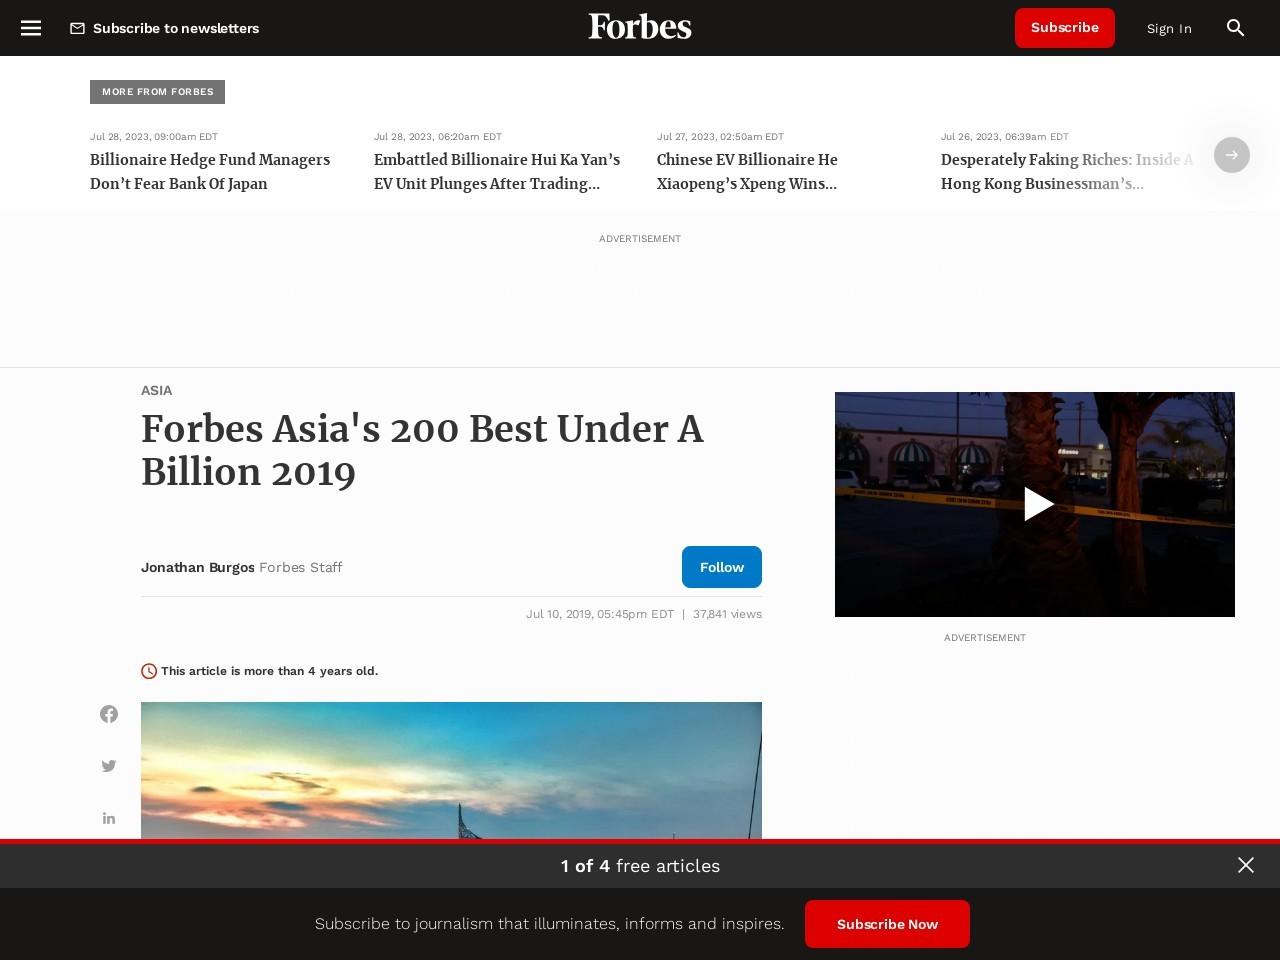 Forbes Asia's 200 Best Under A Billion 2019